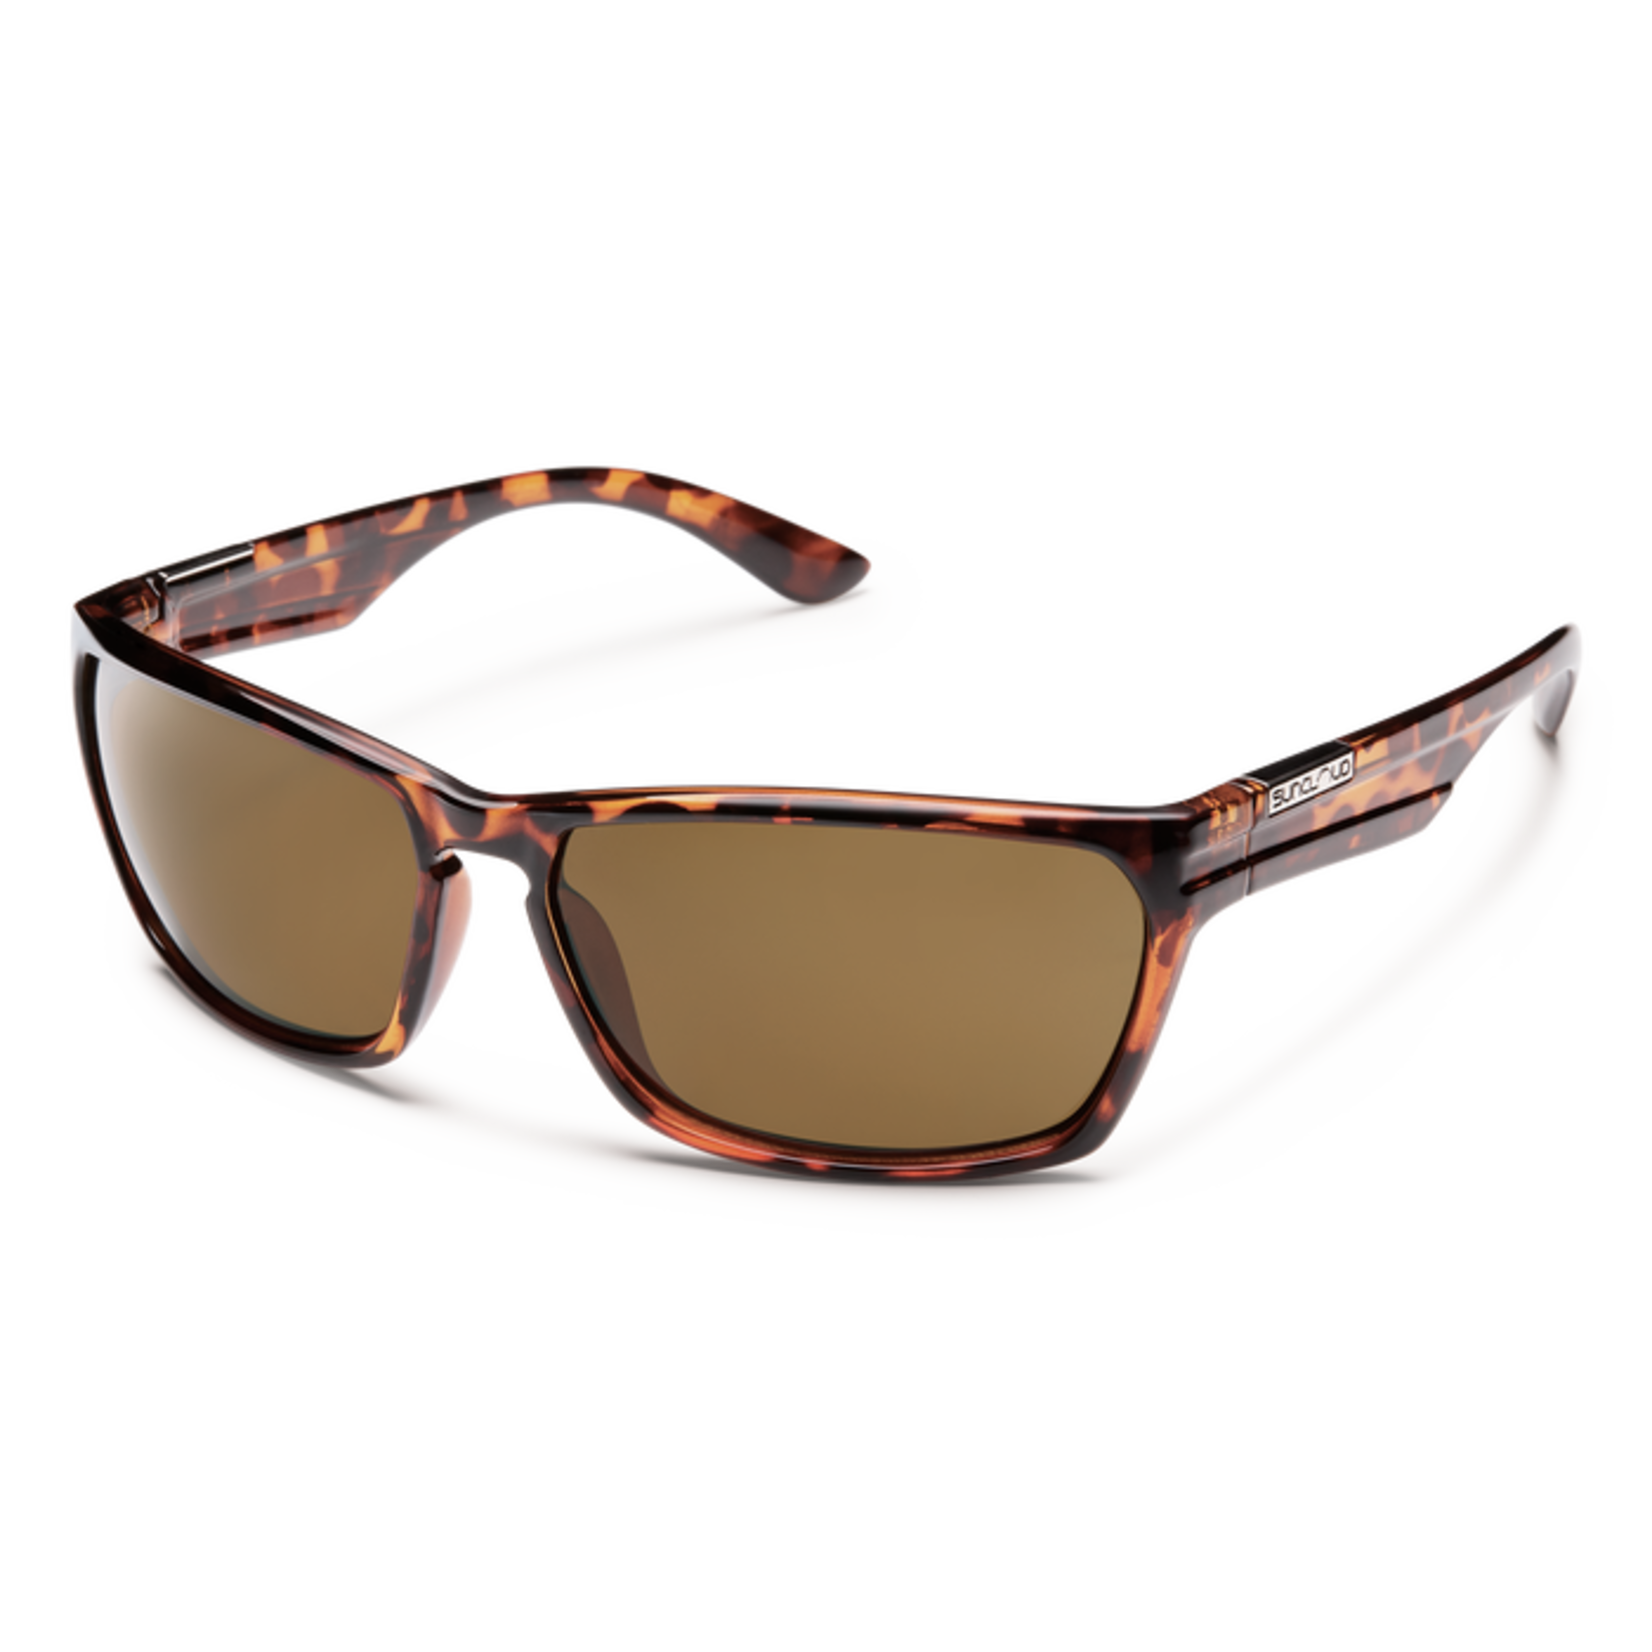 Suncloud Optics Suncloud Cutout Polarized Sunglasses